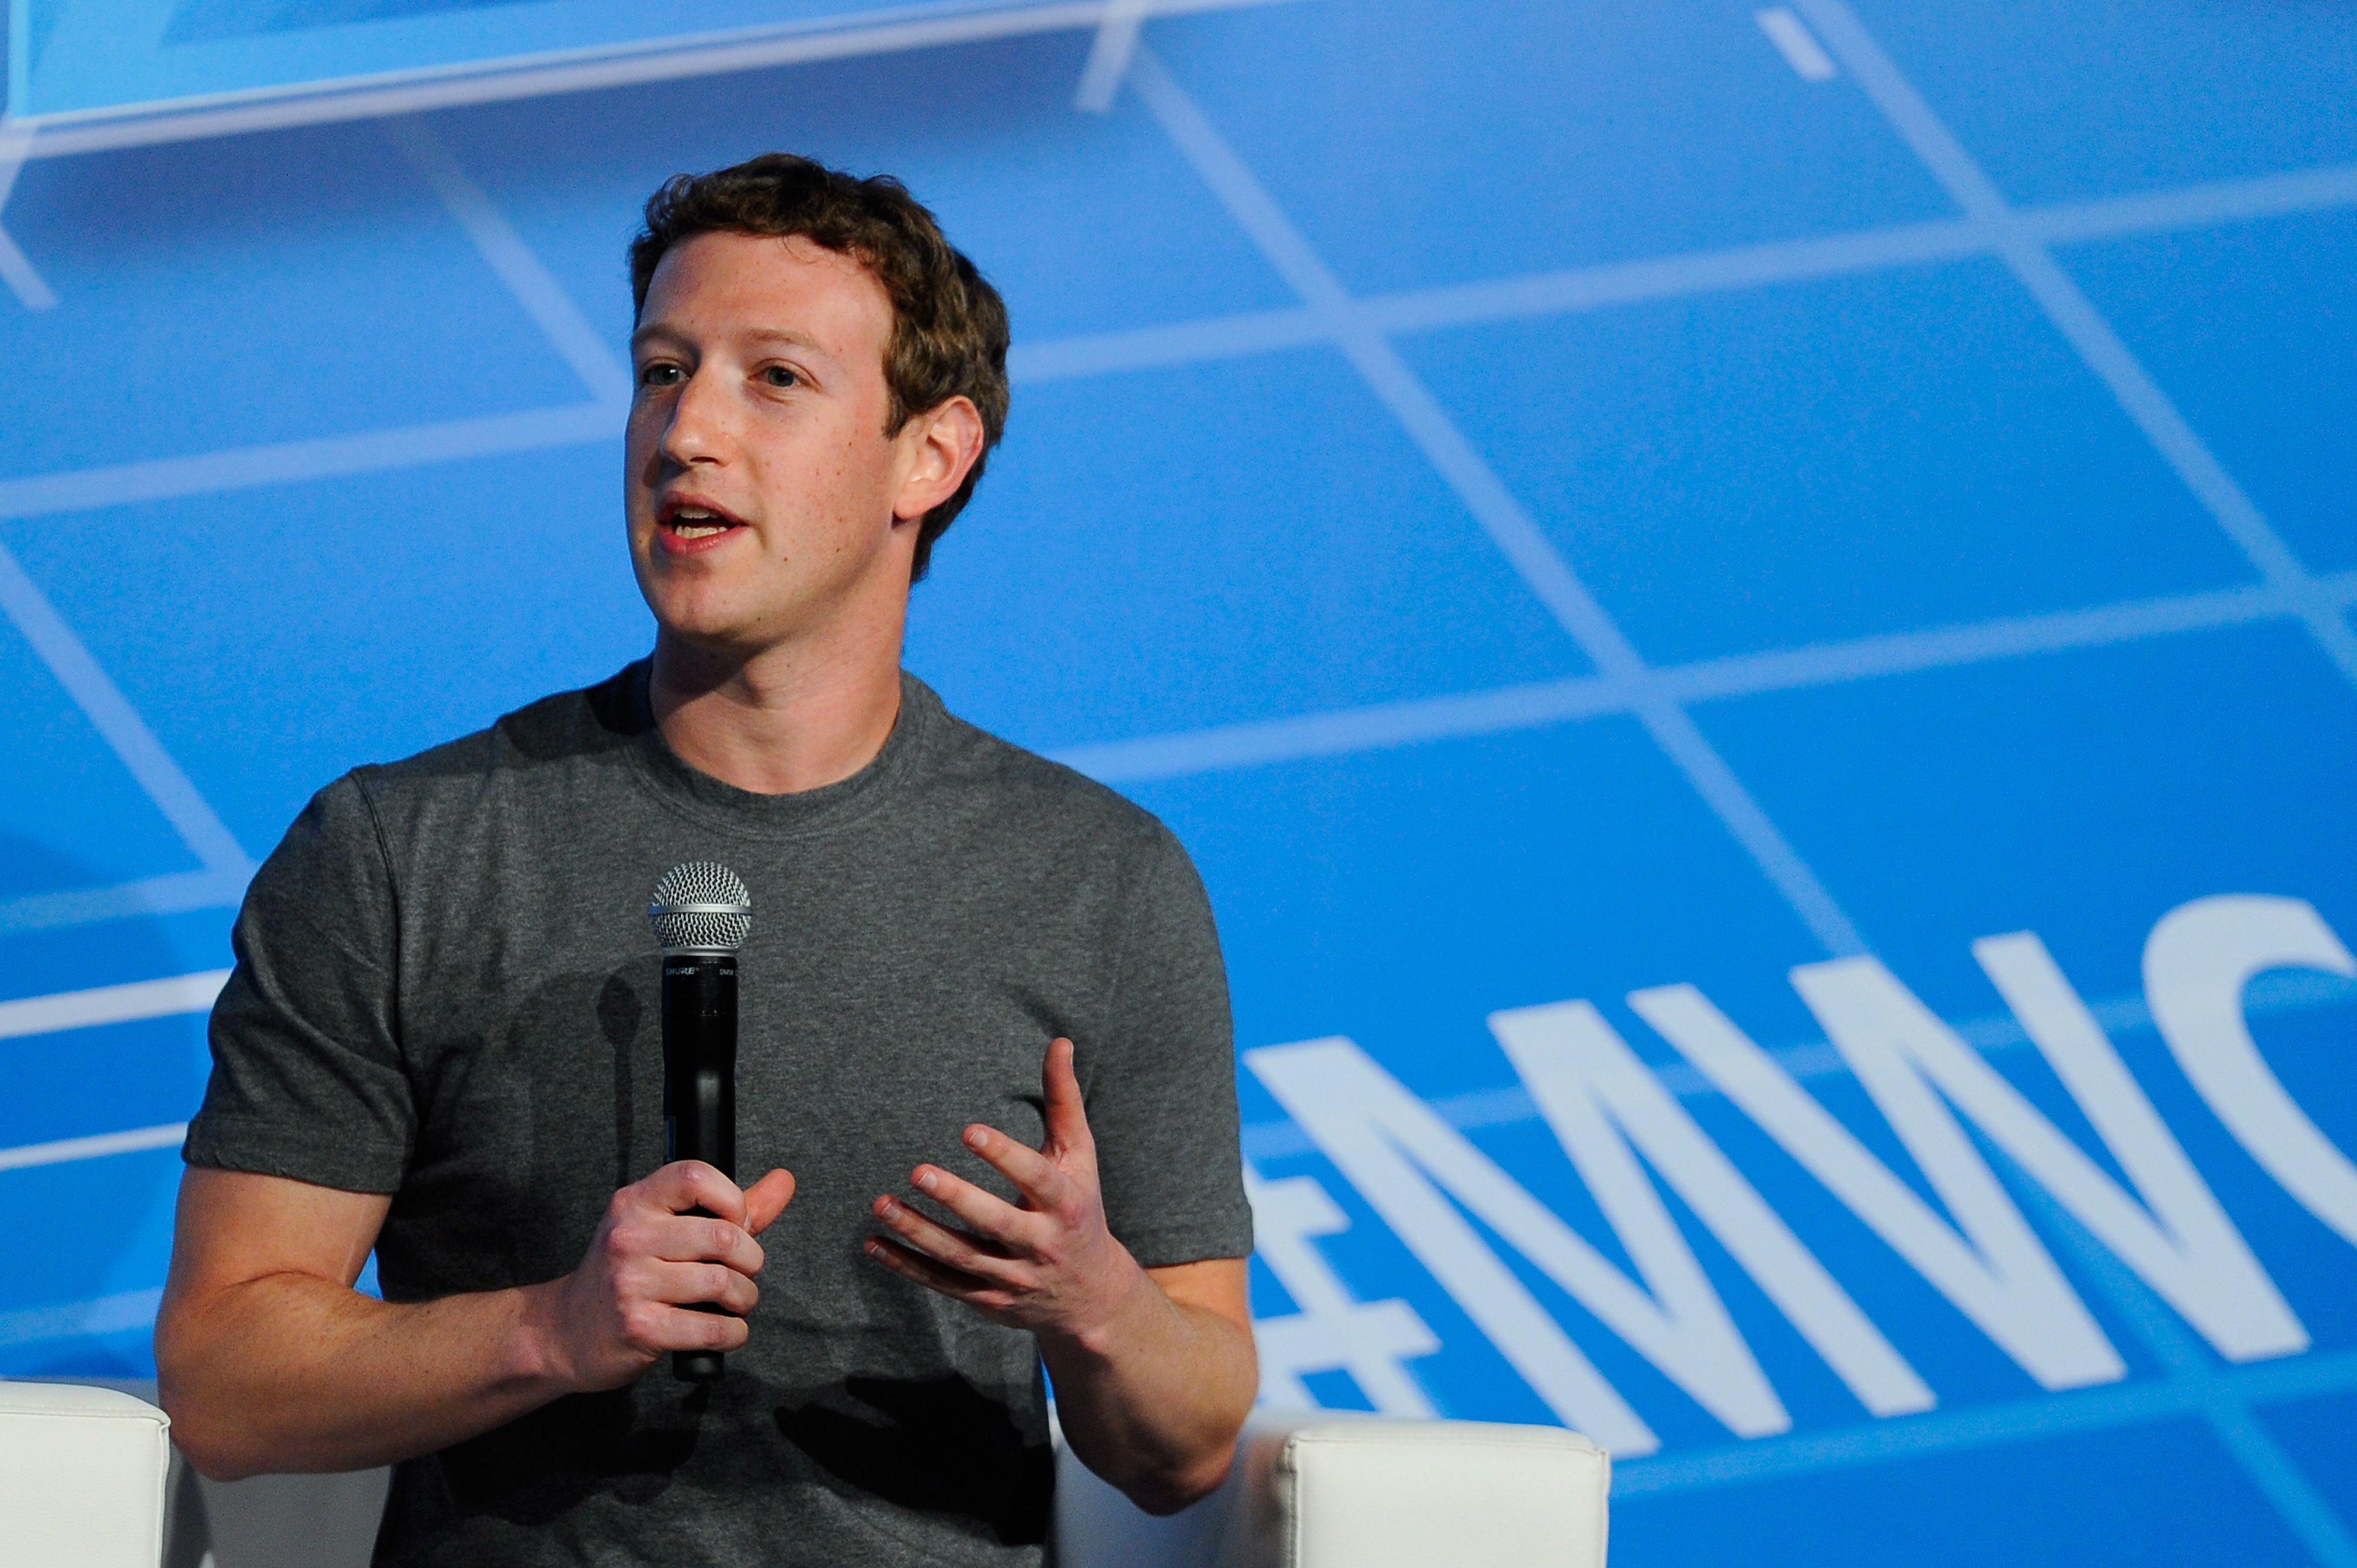 Facebook's Mark Zuckerberg Takes White House To Task Over Privacy